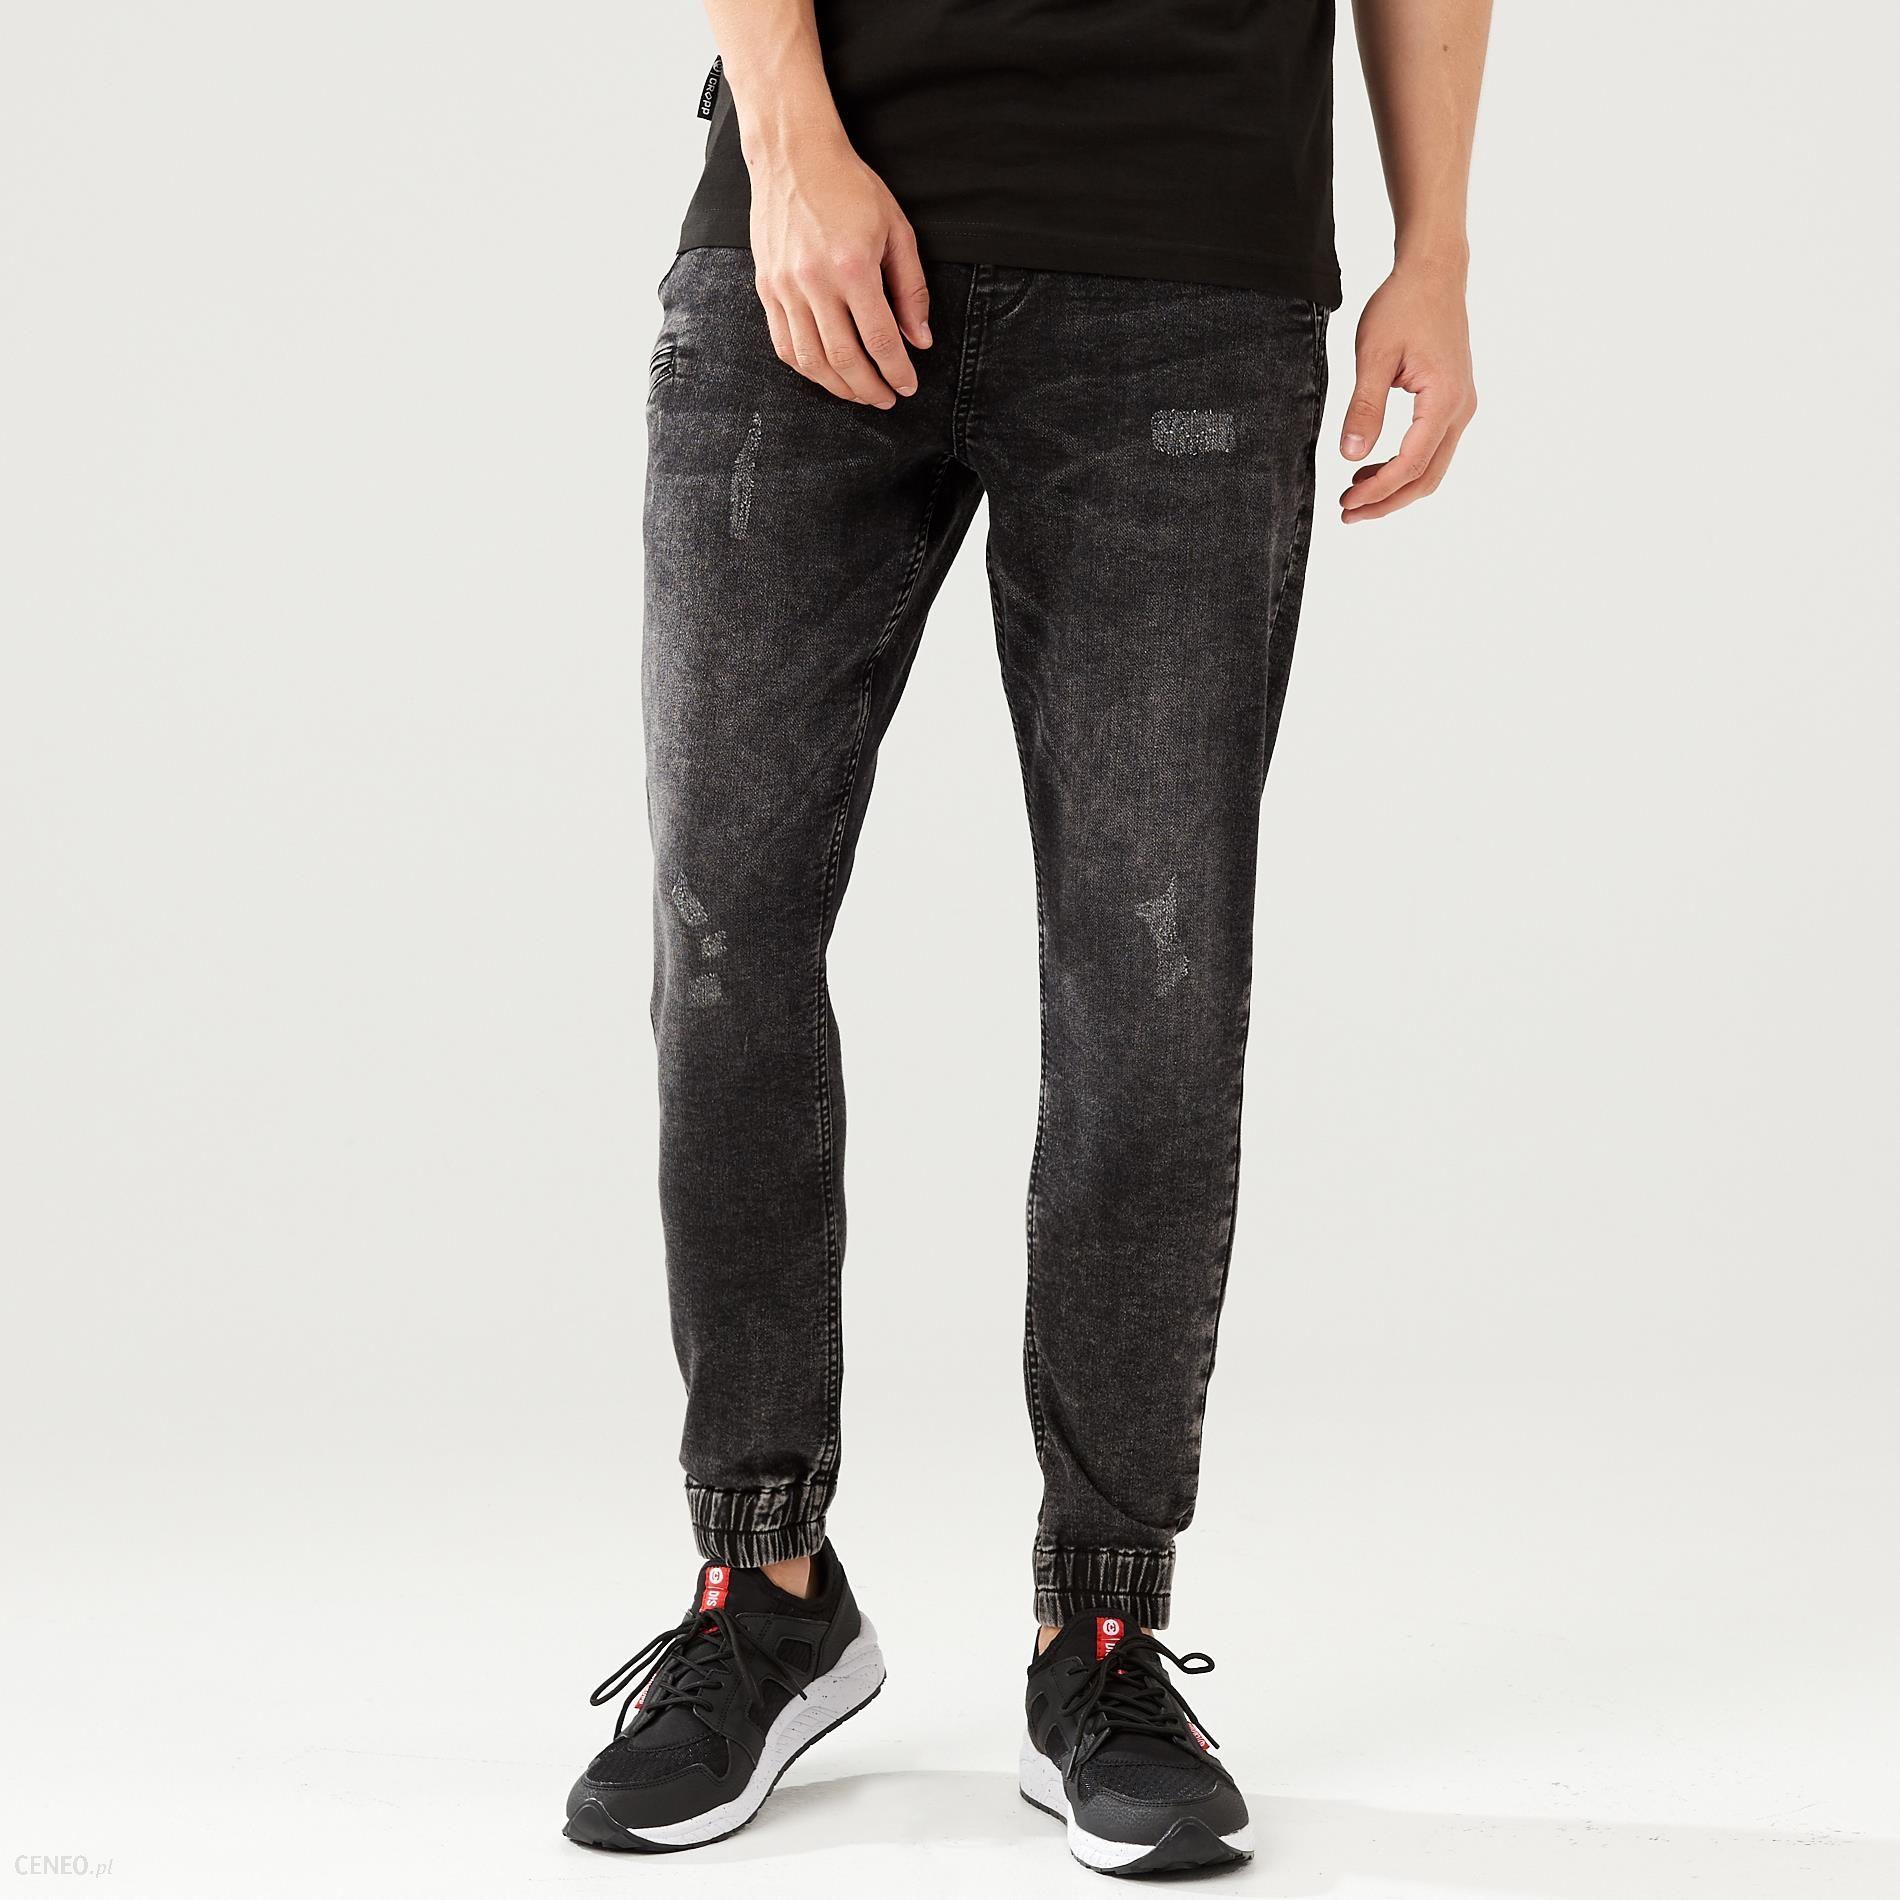 Cropp - Spodnie jogger - Czarny - męska - zdjęcie 1